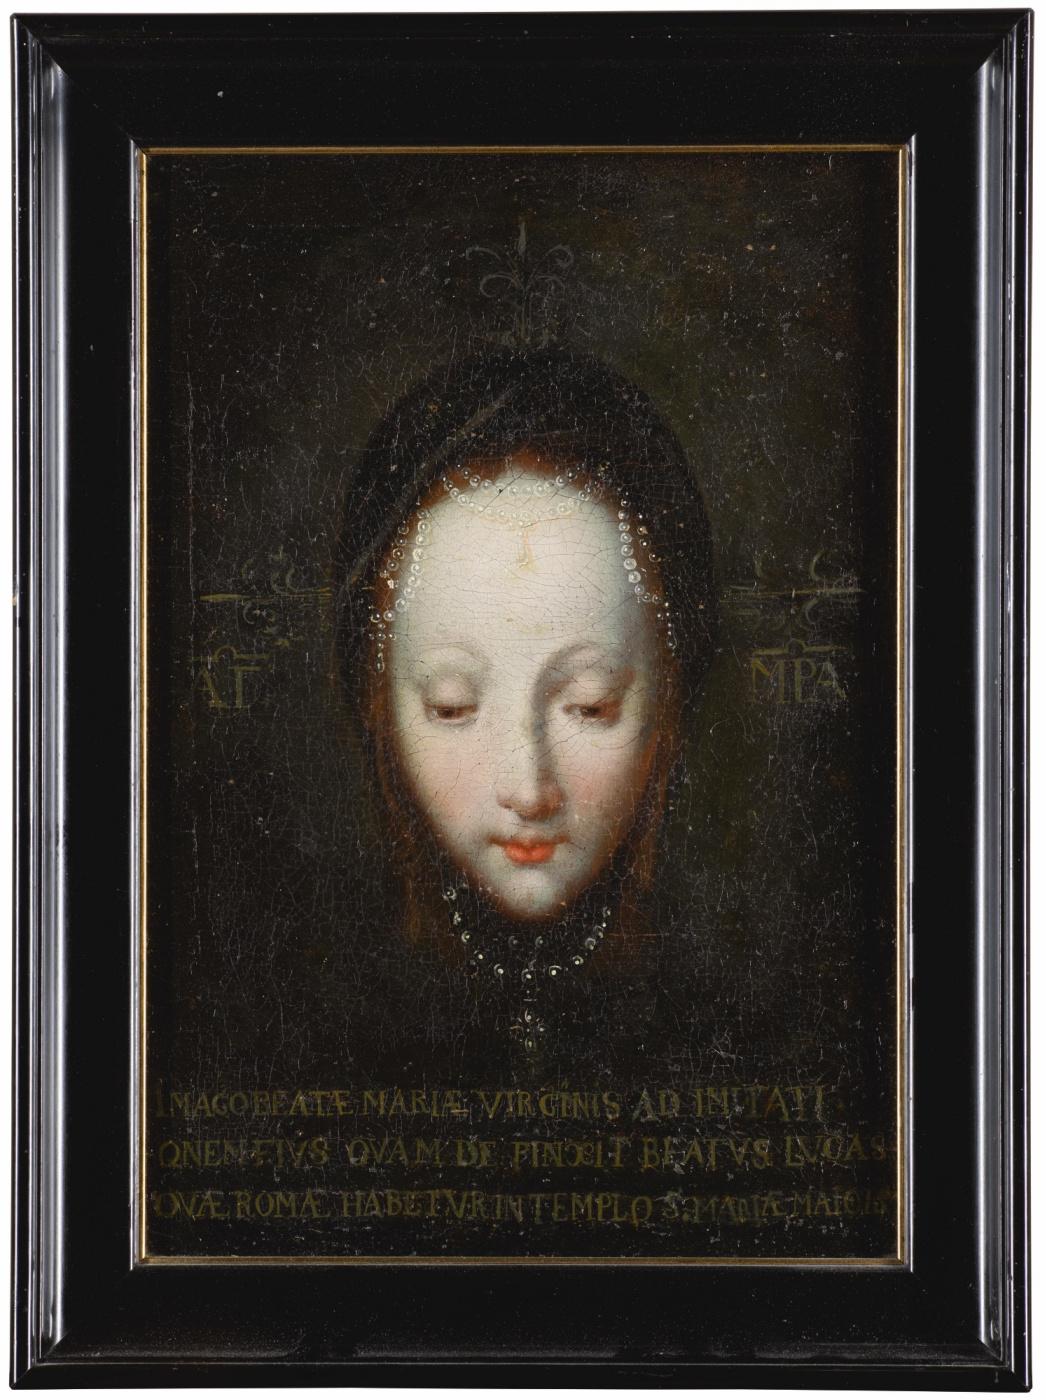 Unknown artist. ICON PORTRAIT OF THE VIRGIN